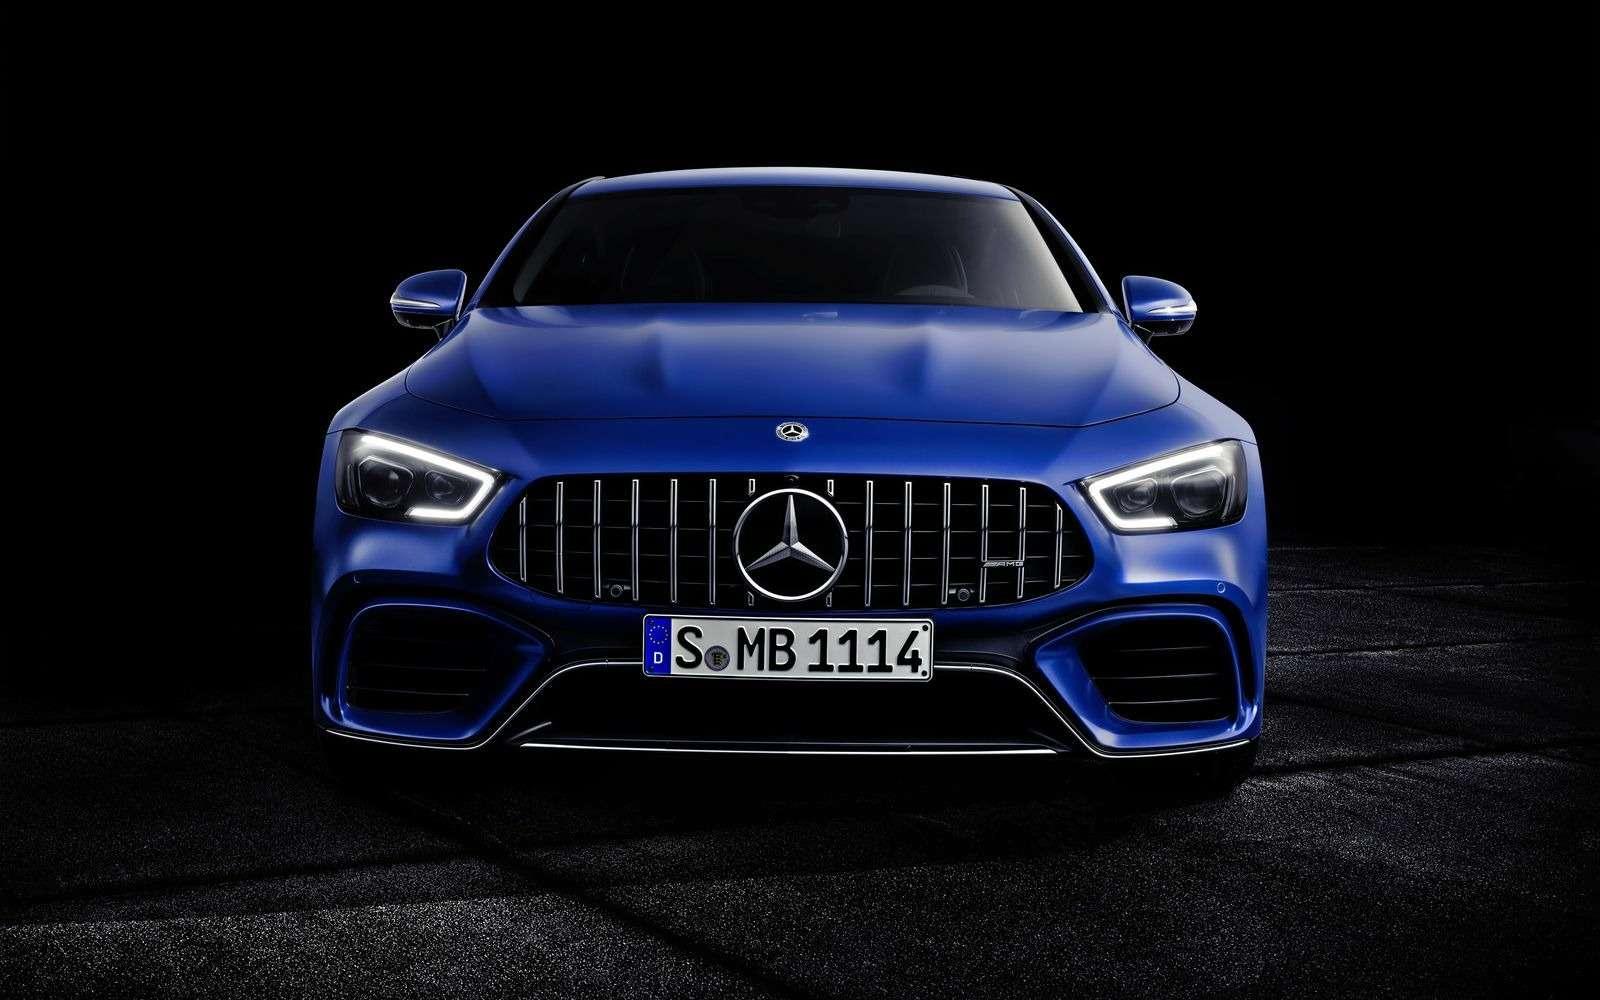 Подмена! Пятидверный Mercedes-AMG GTполучил «тележку» Е-класса— фото 851514